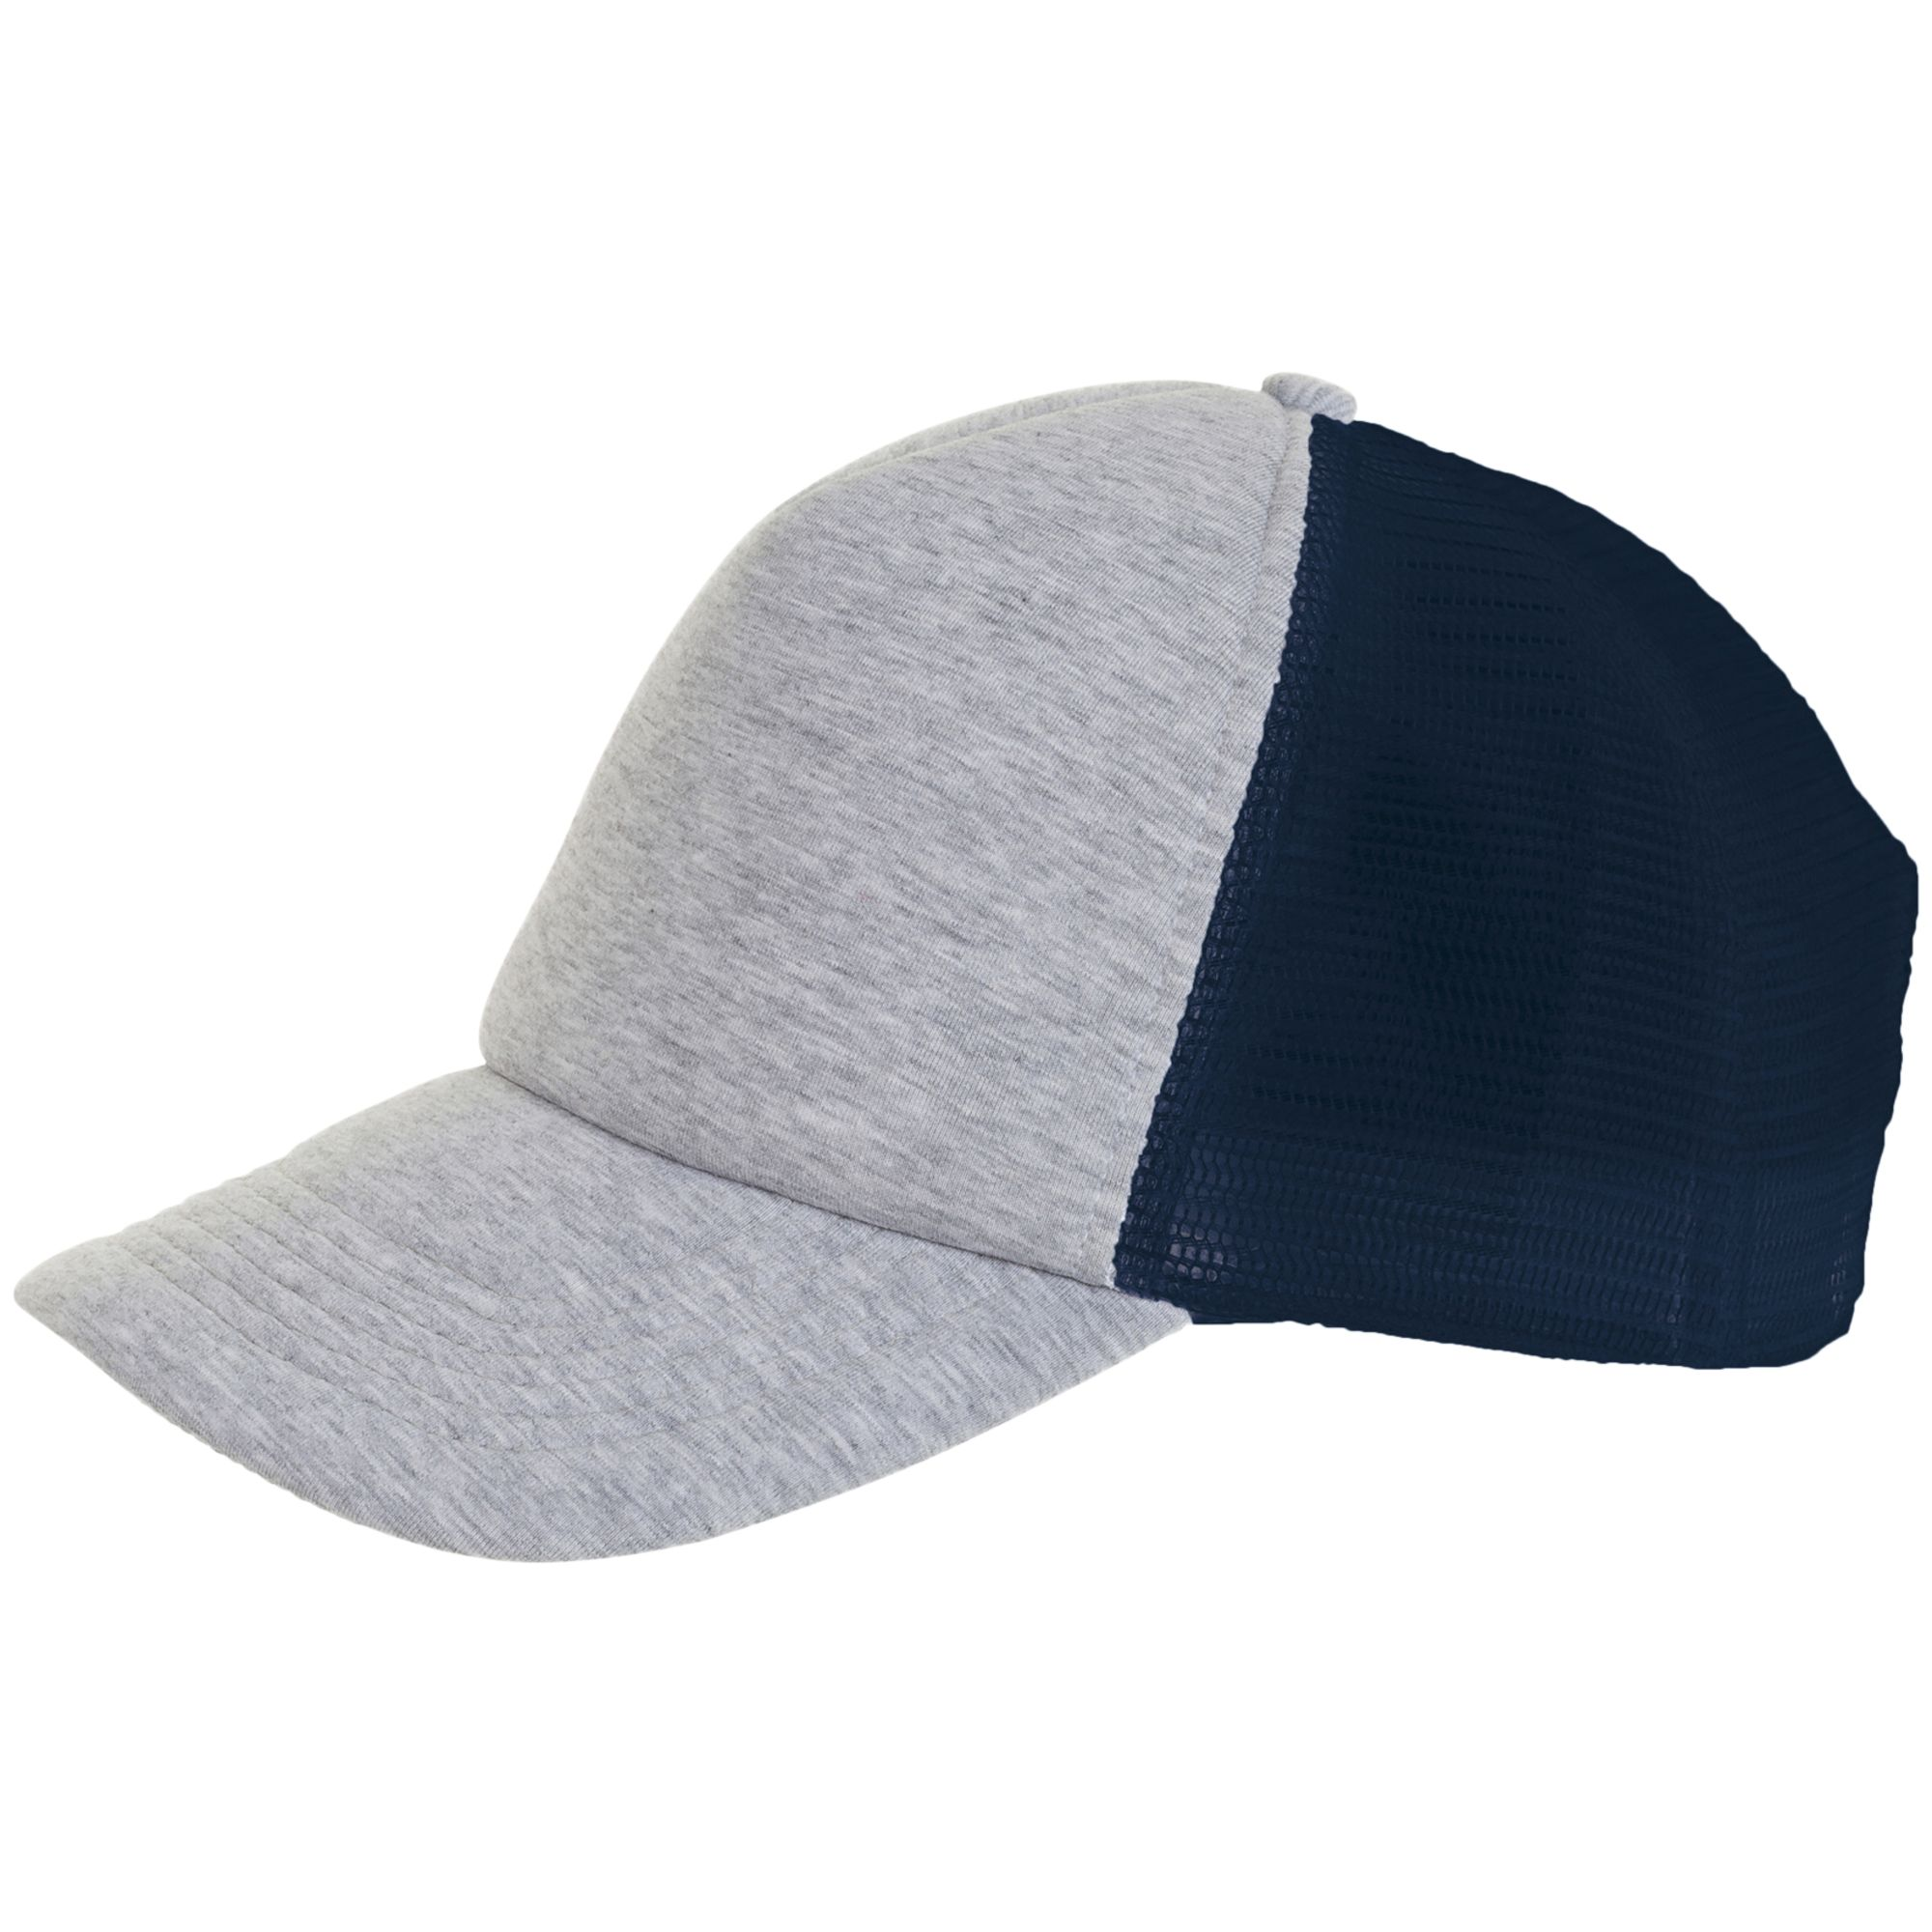 Бейсболка DODGE, серый меланж с темно-синим